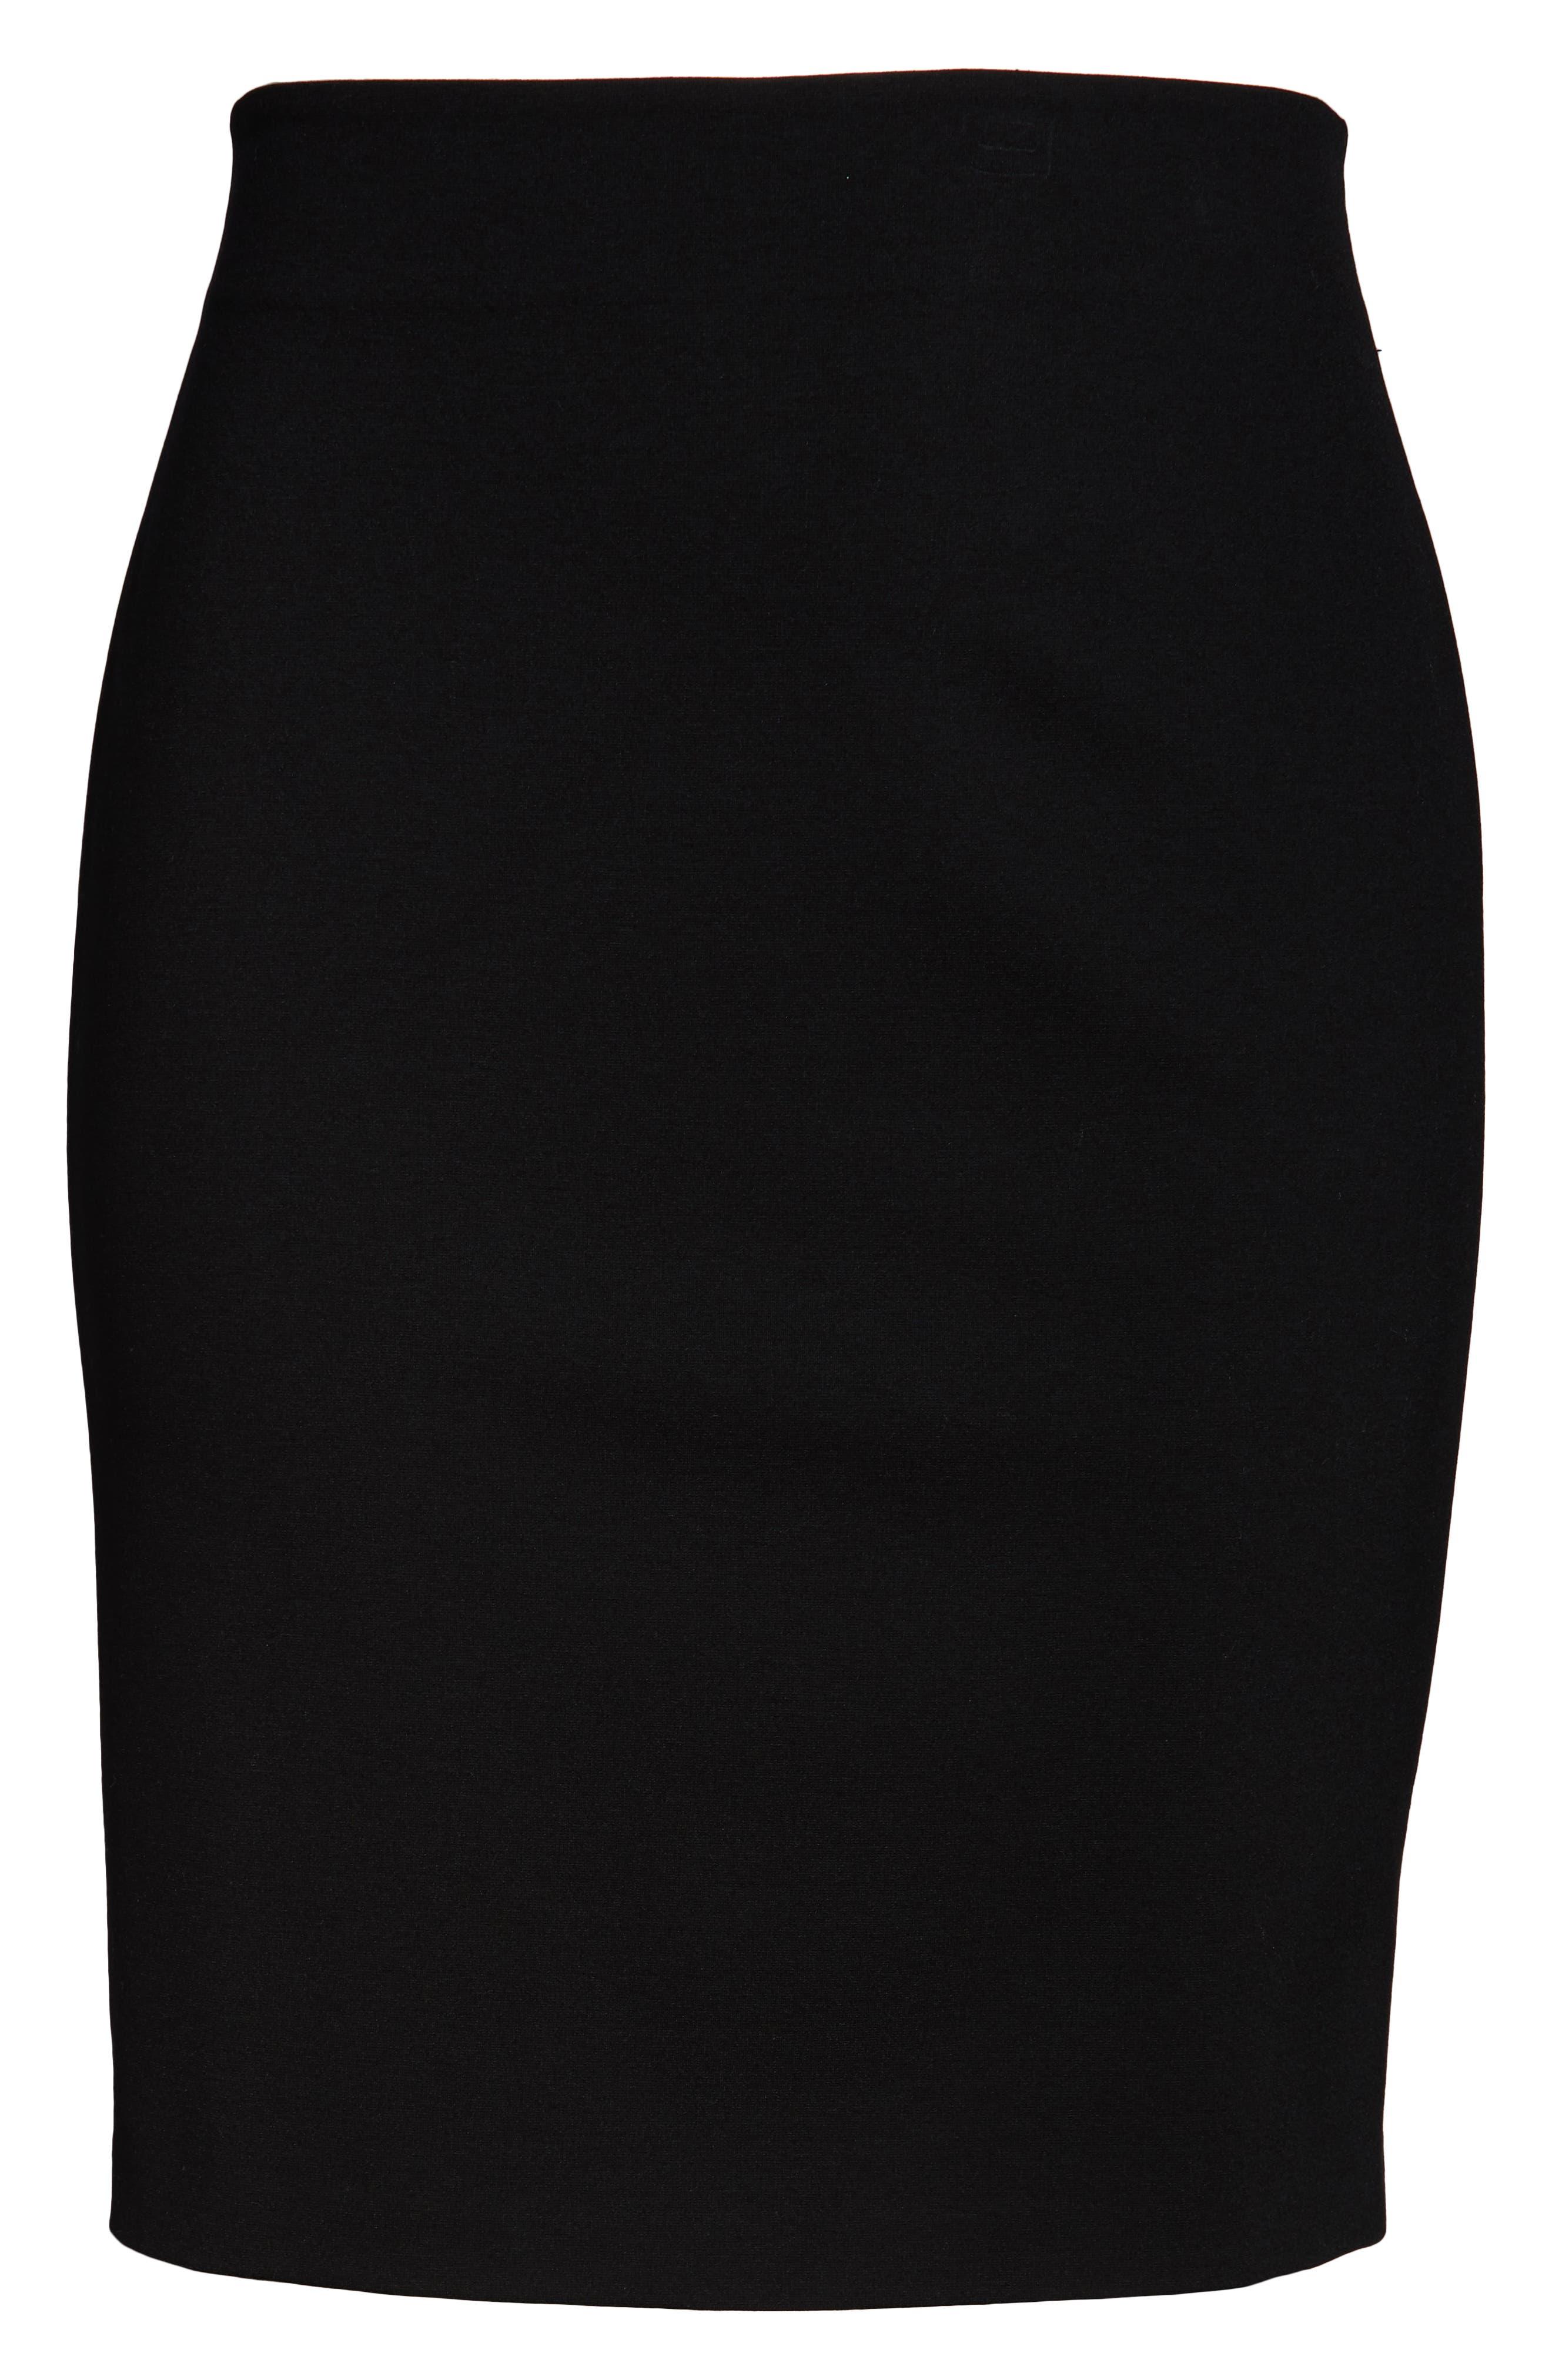 Vince Camuto Knits Ponte Knit Skirt